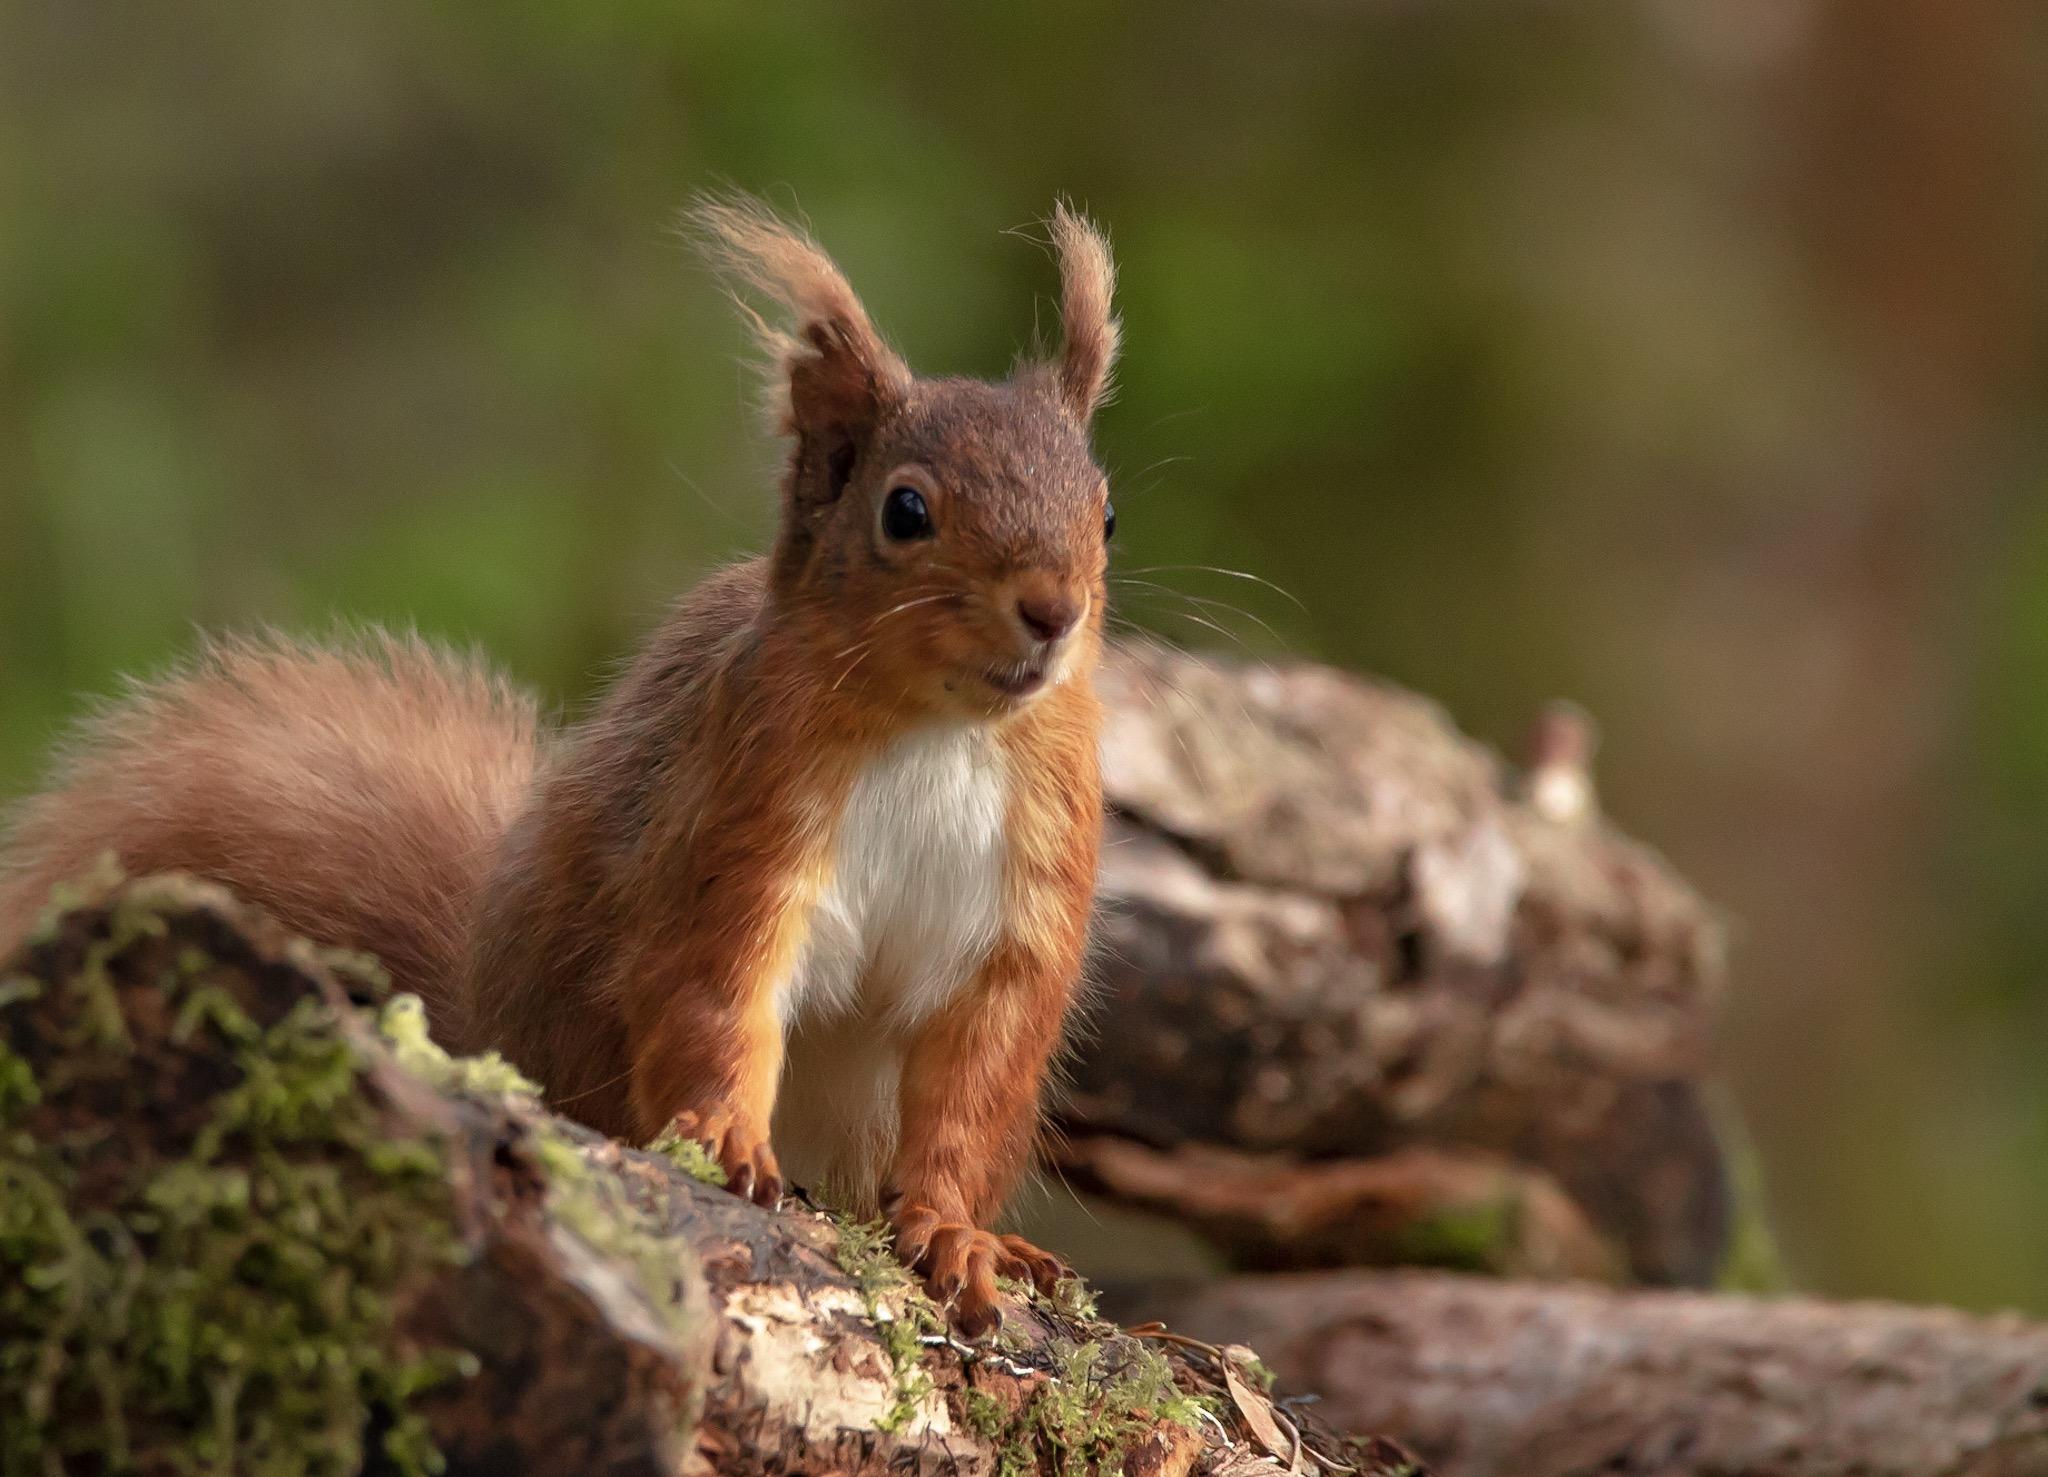 Red squirrel by Jonny Rosborough